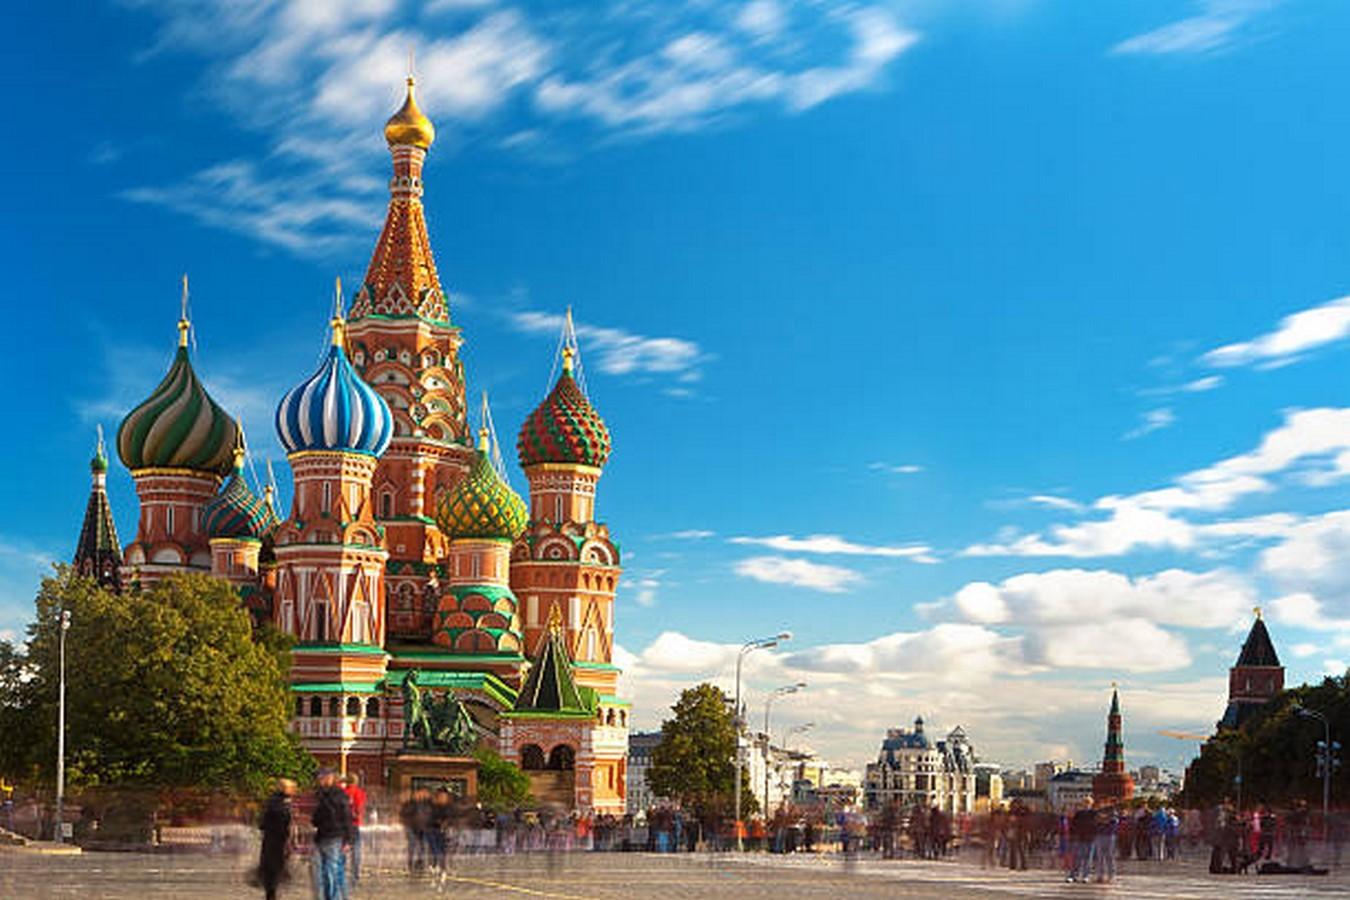 Basil's Cathedral by Pestnik Yakolev and Ivan Barma - Sheet1